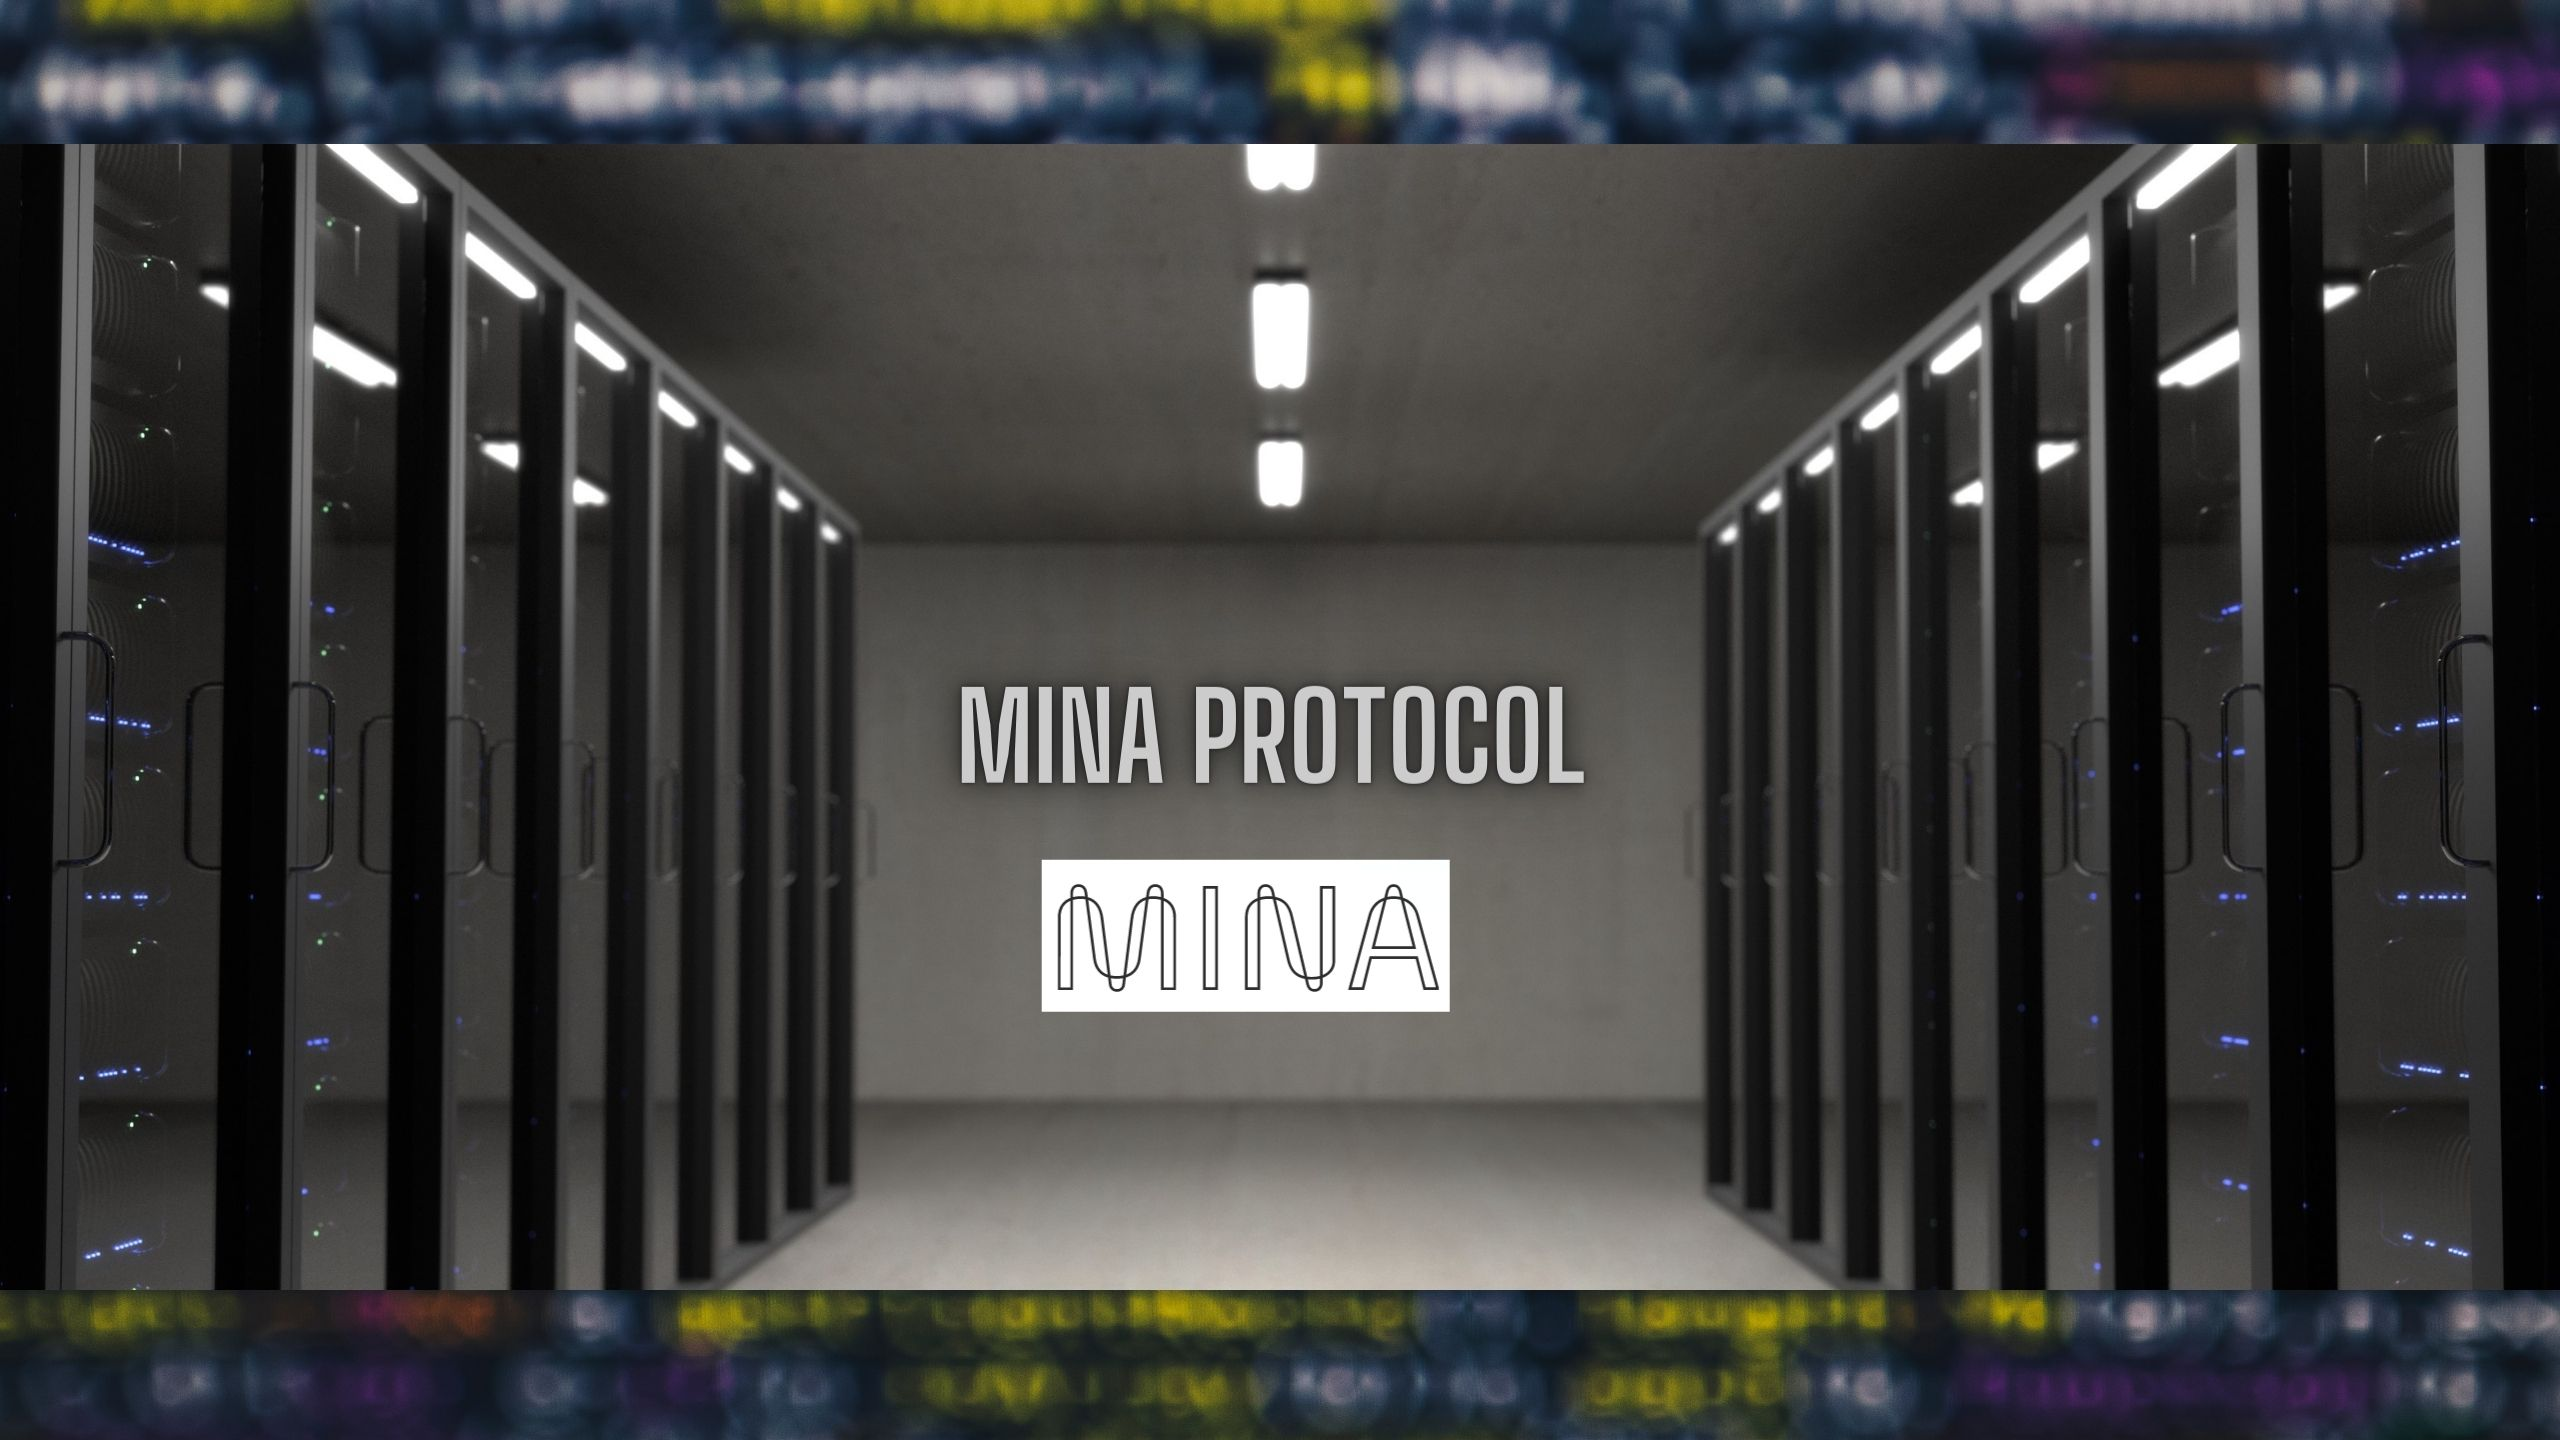 Mina Protocol Image